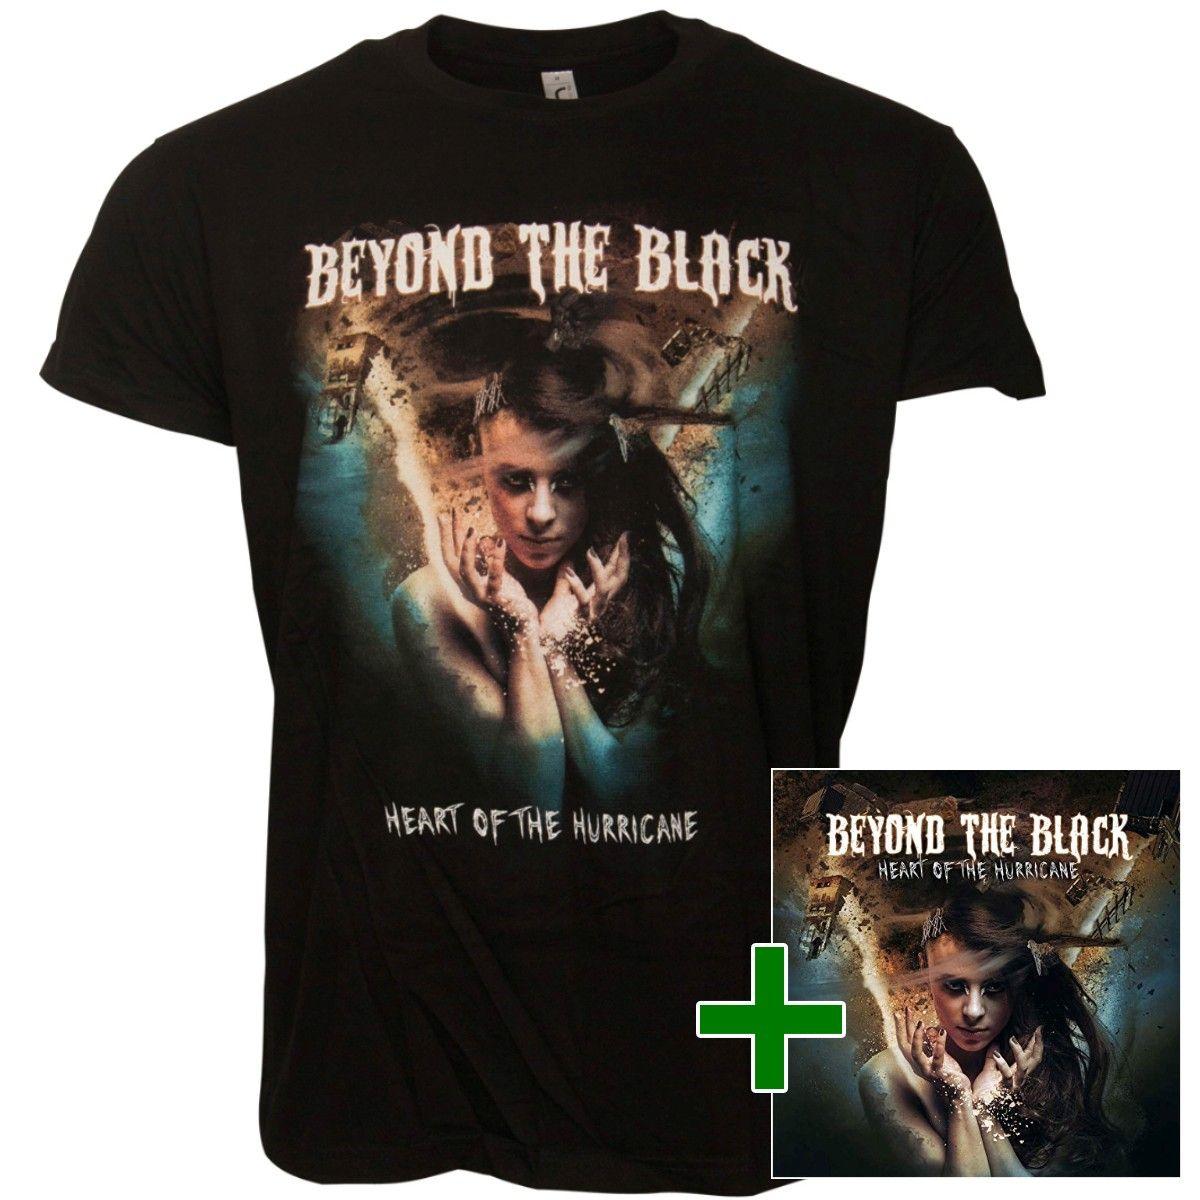 Beyond The Black - Set CD + Tour Shirt Heart Of The Hurricane